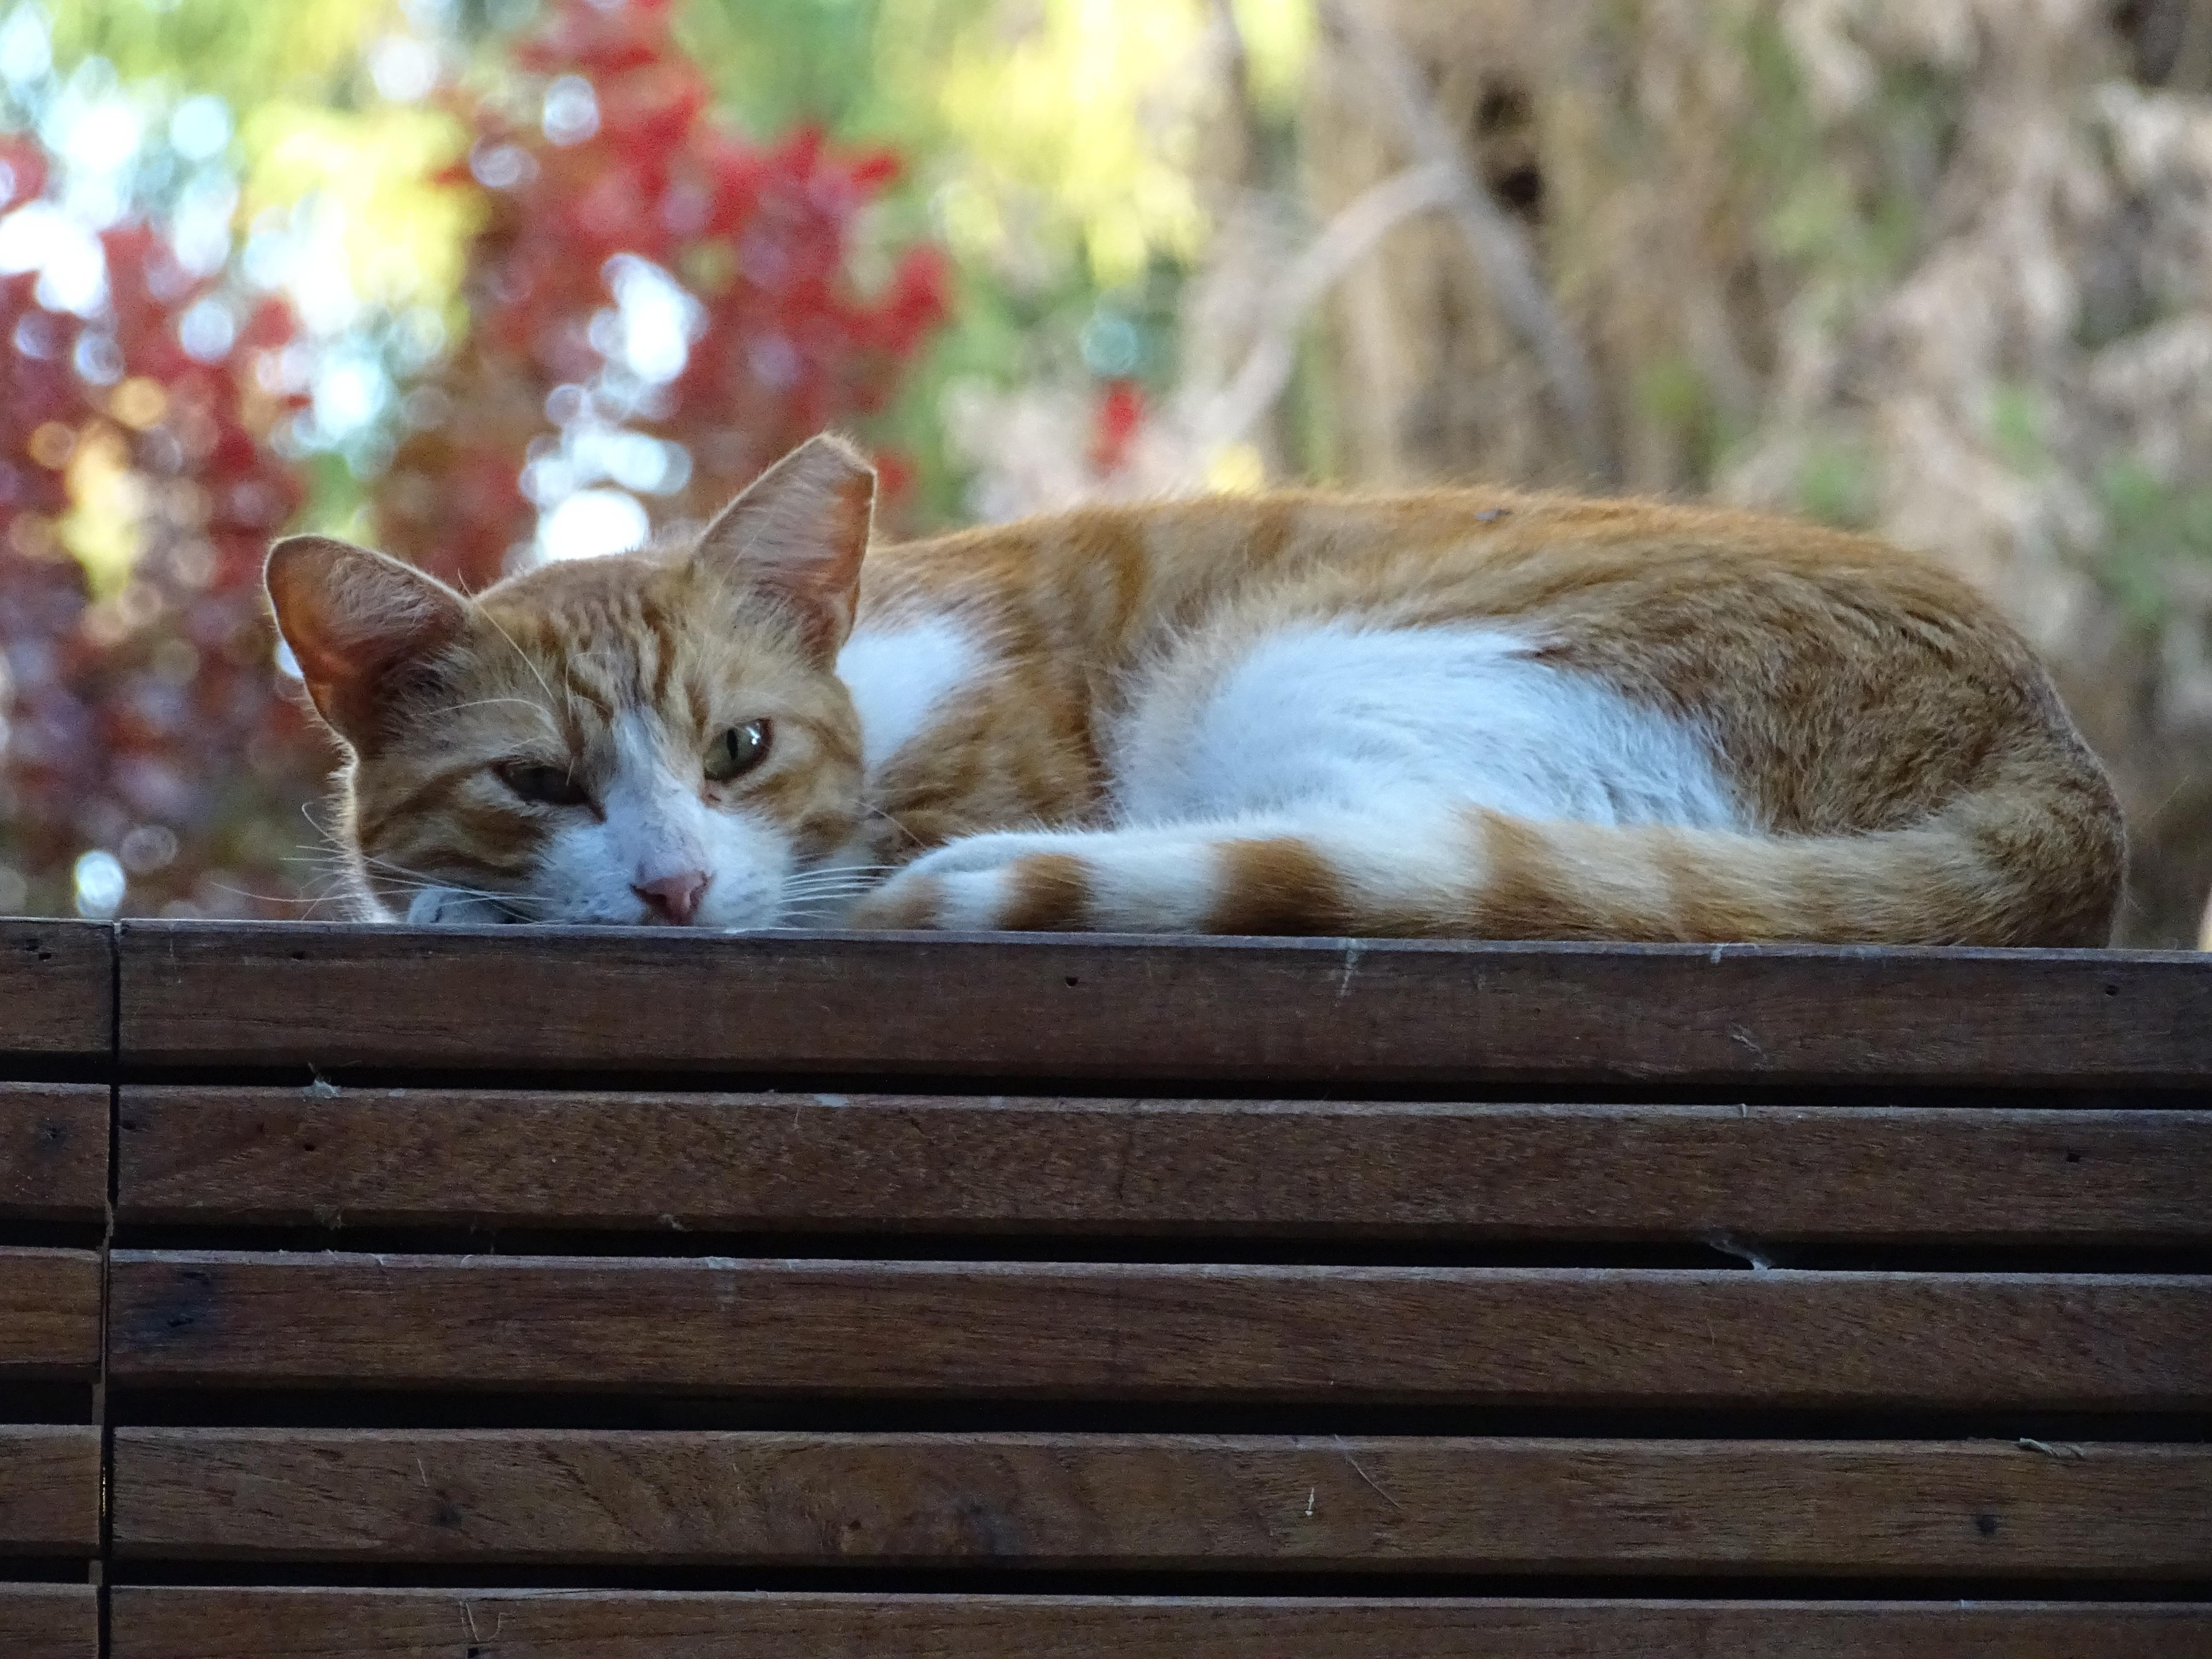 zdarma velké kočičky